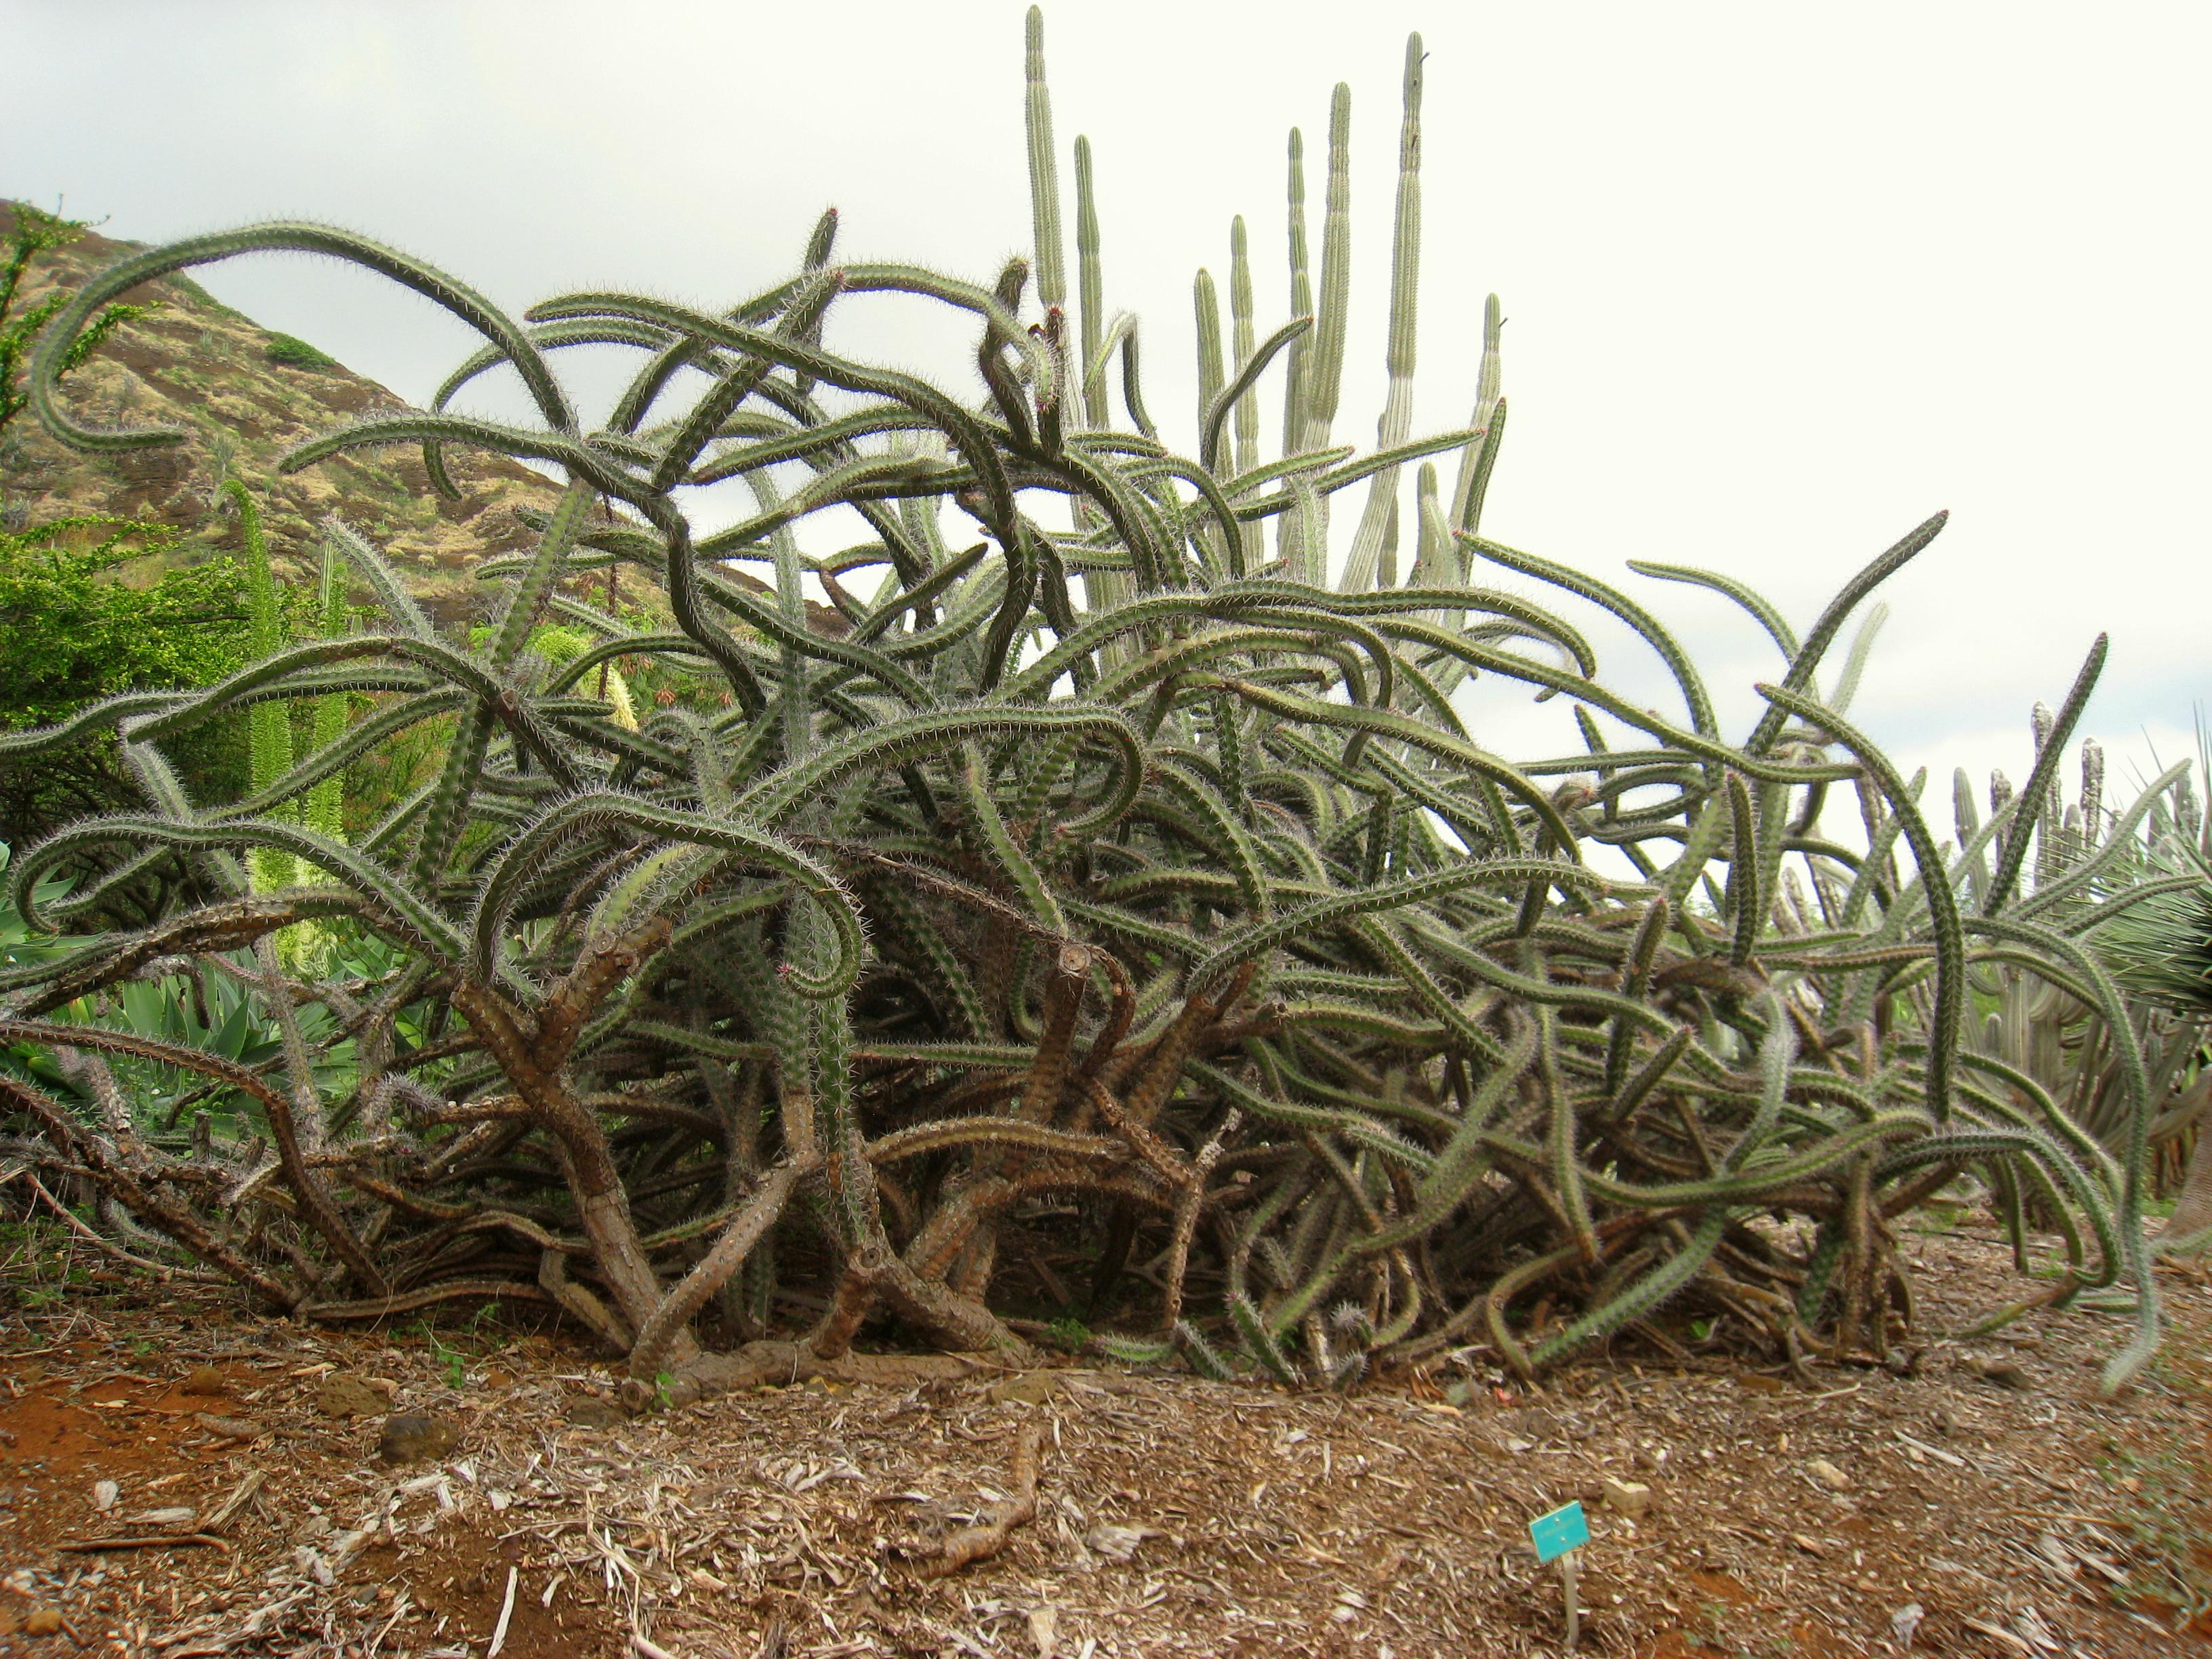 File Rathbunia Alamosensis Koko Crater Botanical Garden Img 2202 Jpg Wikimedia Commons